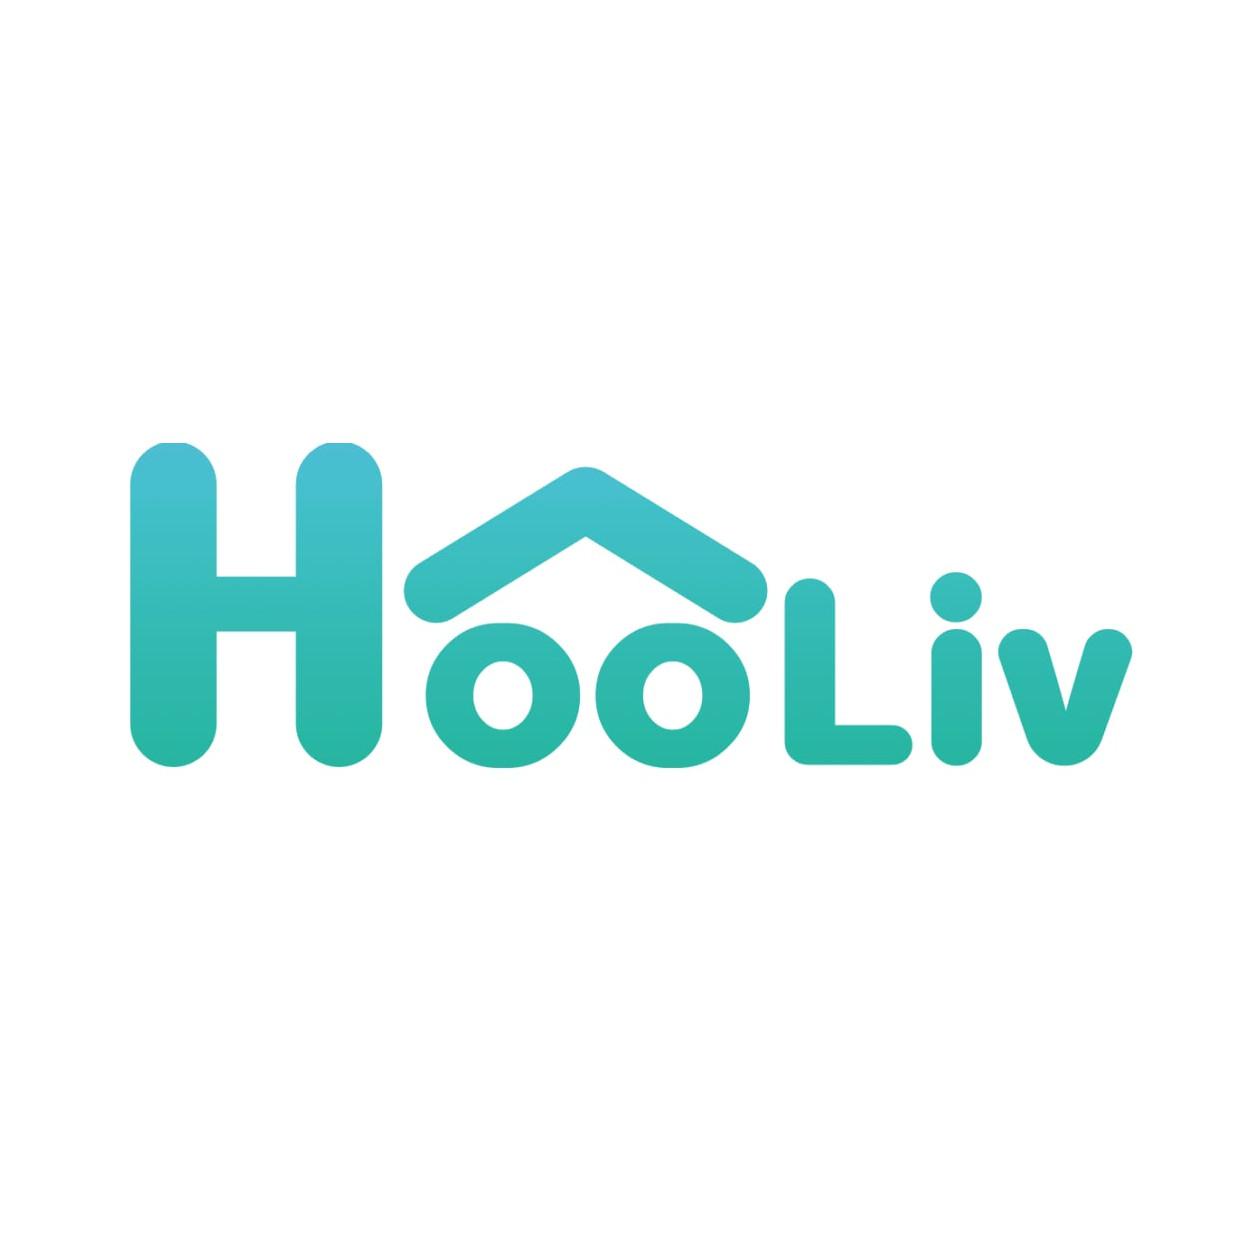 Hooliv - Coliving Company